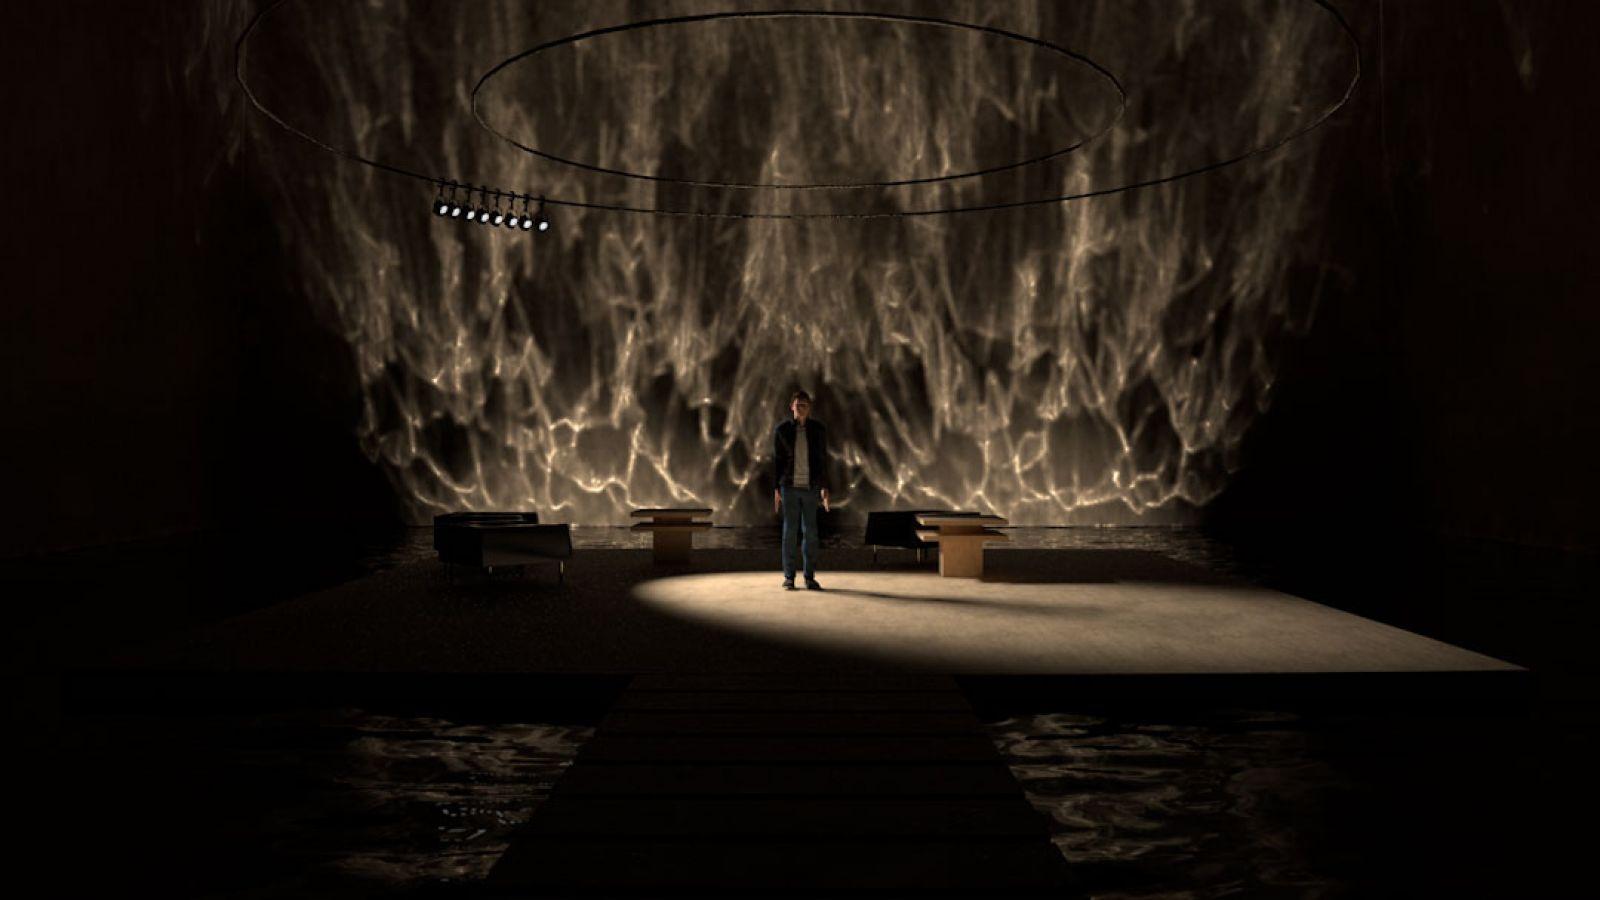 Peachy Blade Runner 2049 Lighting Diagrams Lighting Roger A Deakins Wiring Digital Resources Bemuashebarightsorg